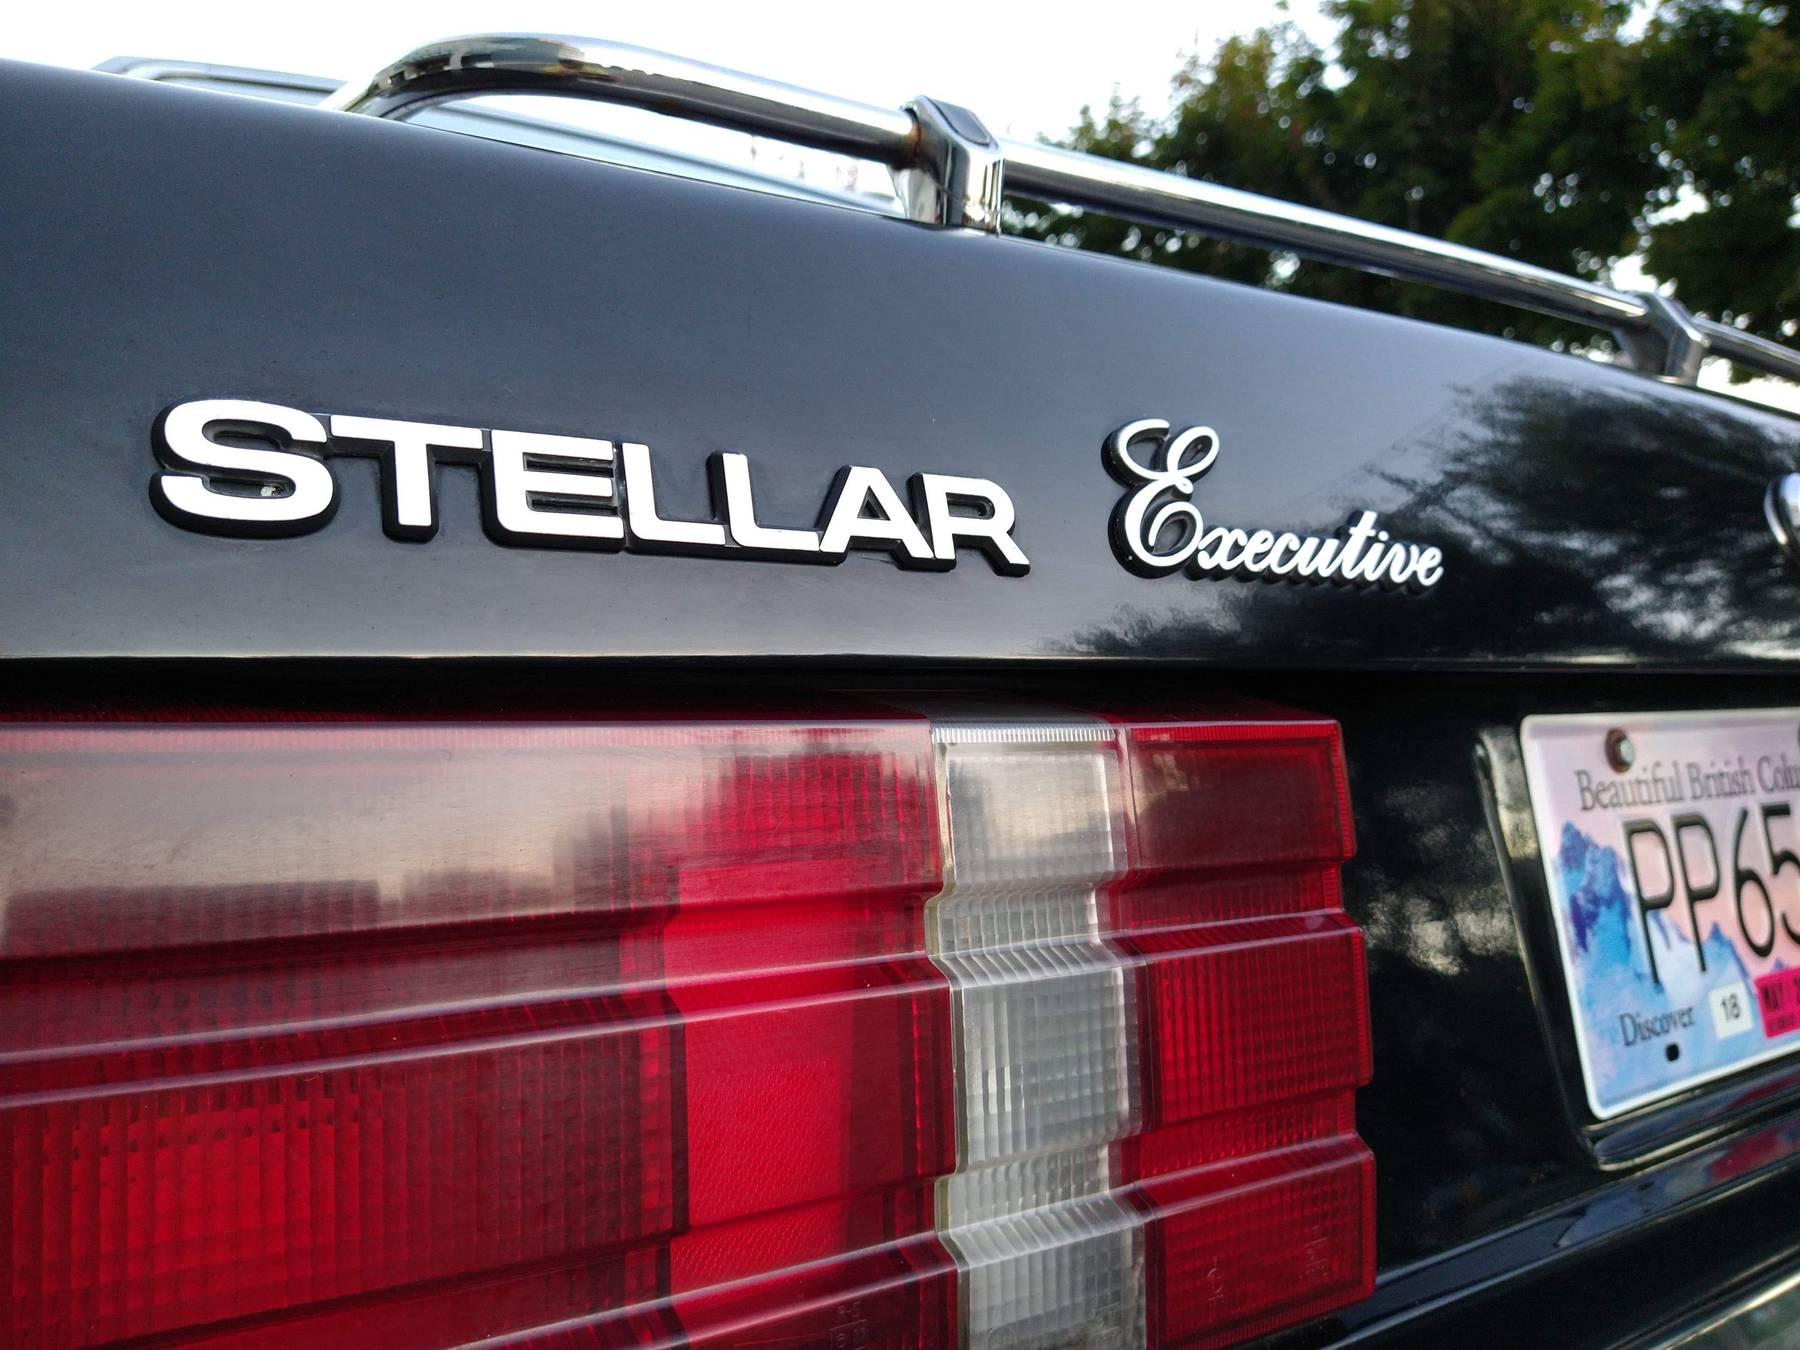 1986 Hyundai Stellar Executive badging